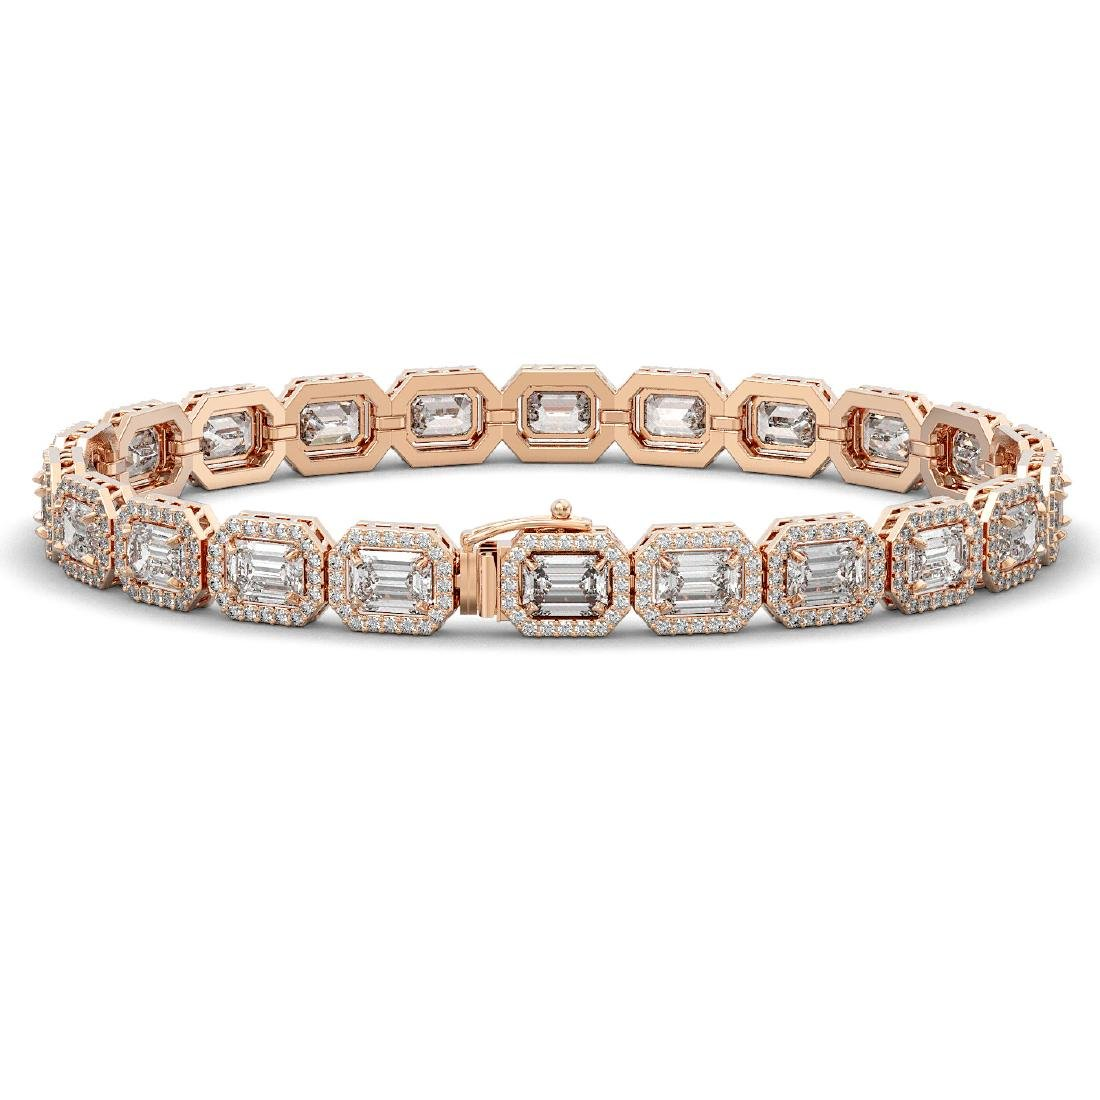 16.72 CTW Emerald Cut Diamond Designer Bracelet 18K - 2